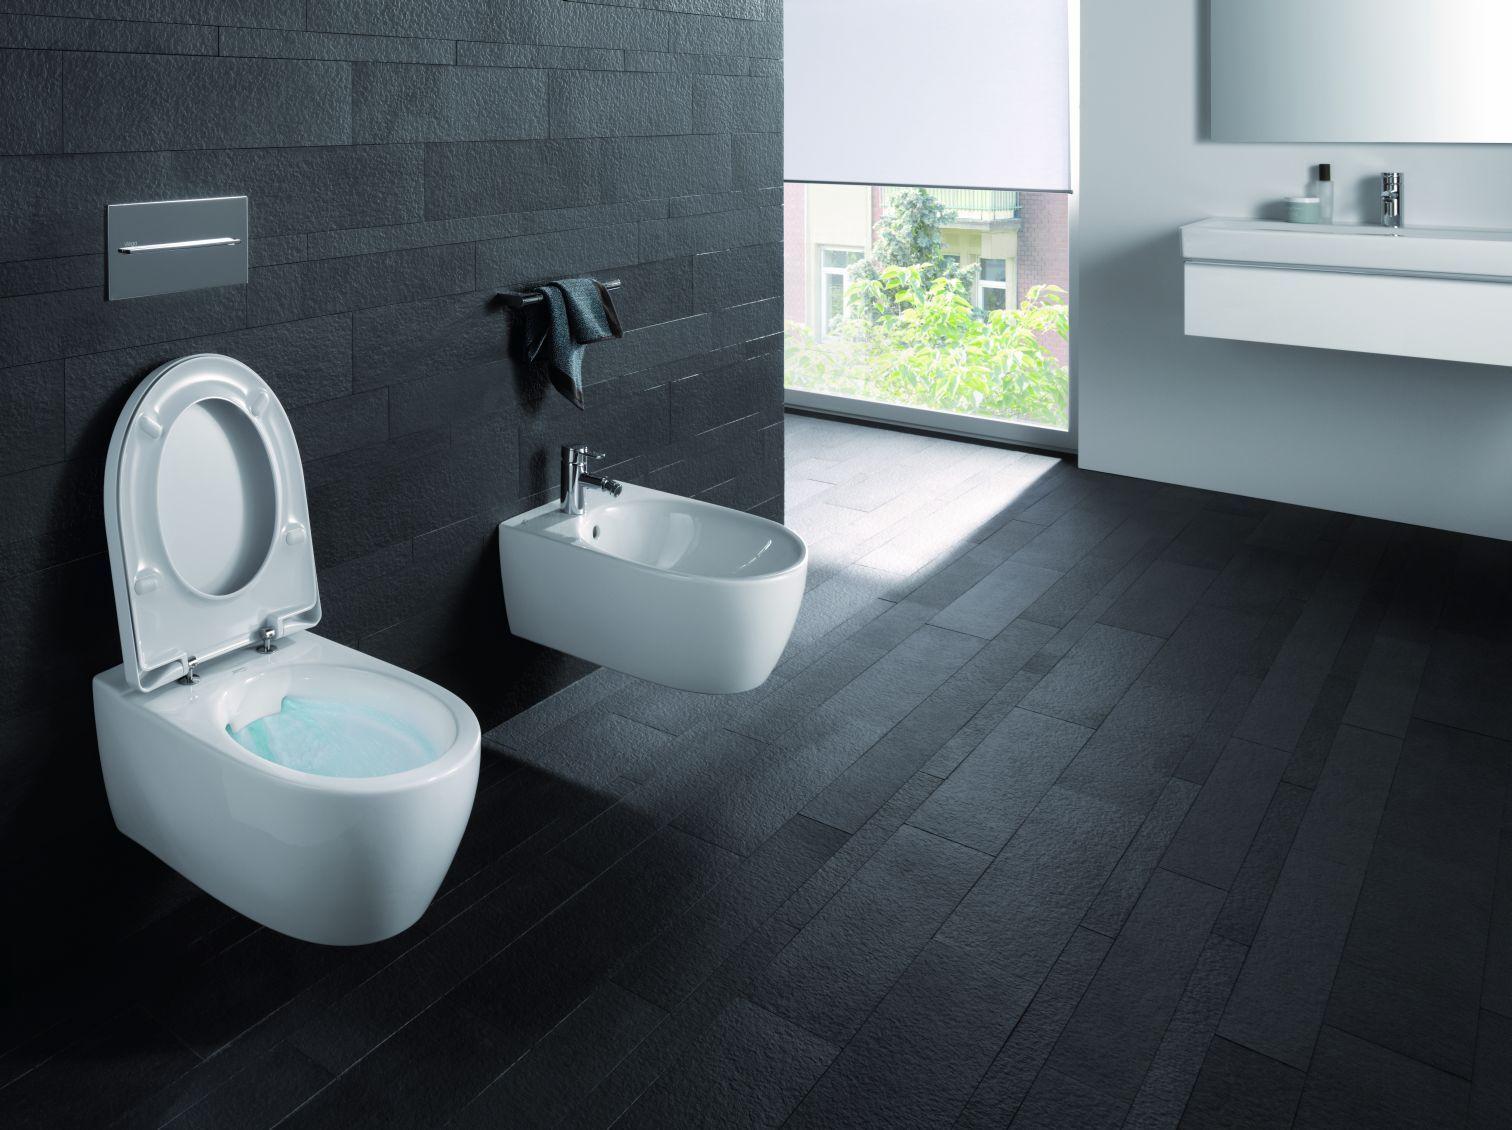 Toilet Zonder Spoelrand : Sphinx rimfree toilet zonder spoelrand voor betere hygiene